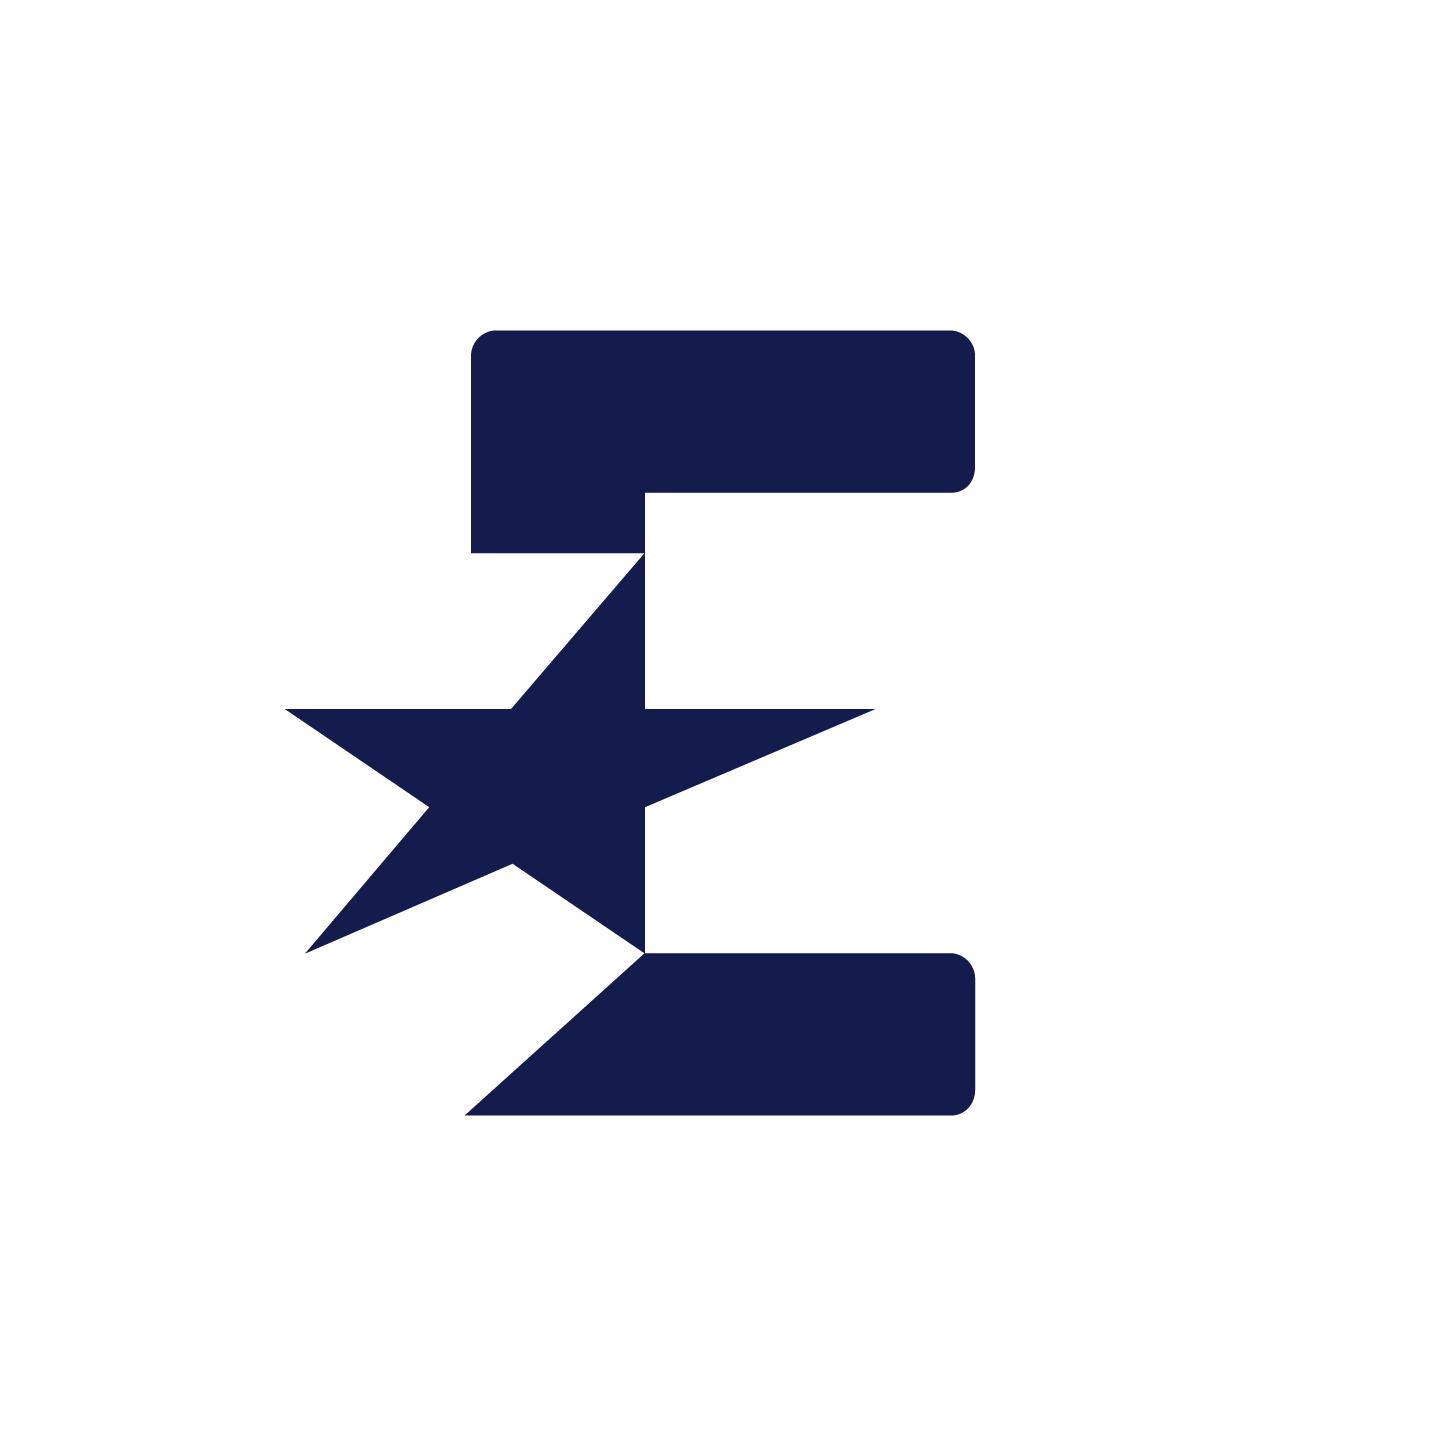 Eurosport brand